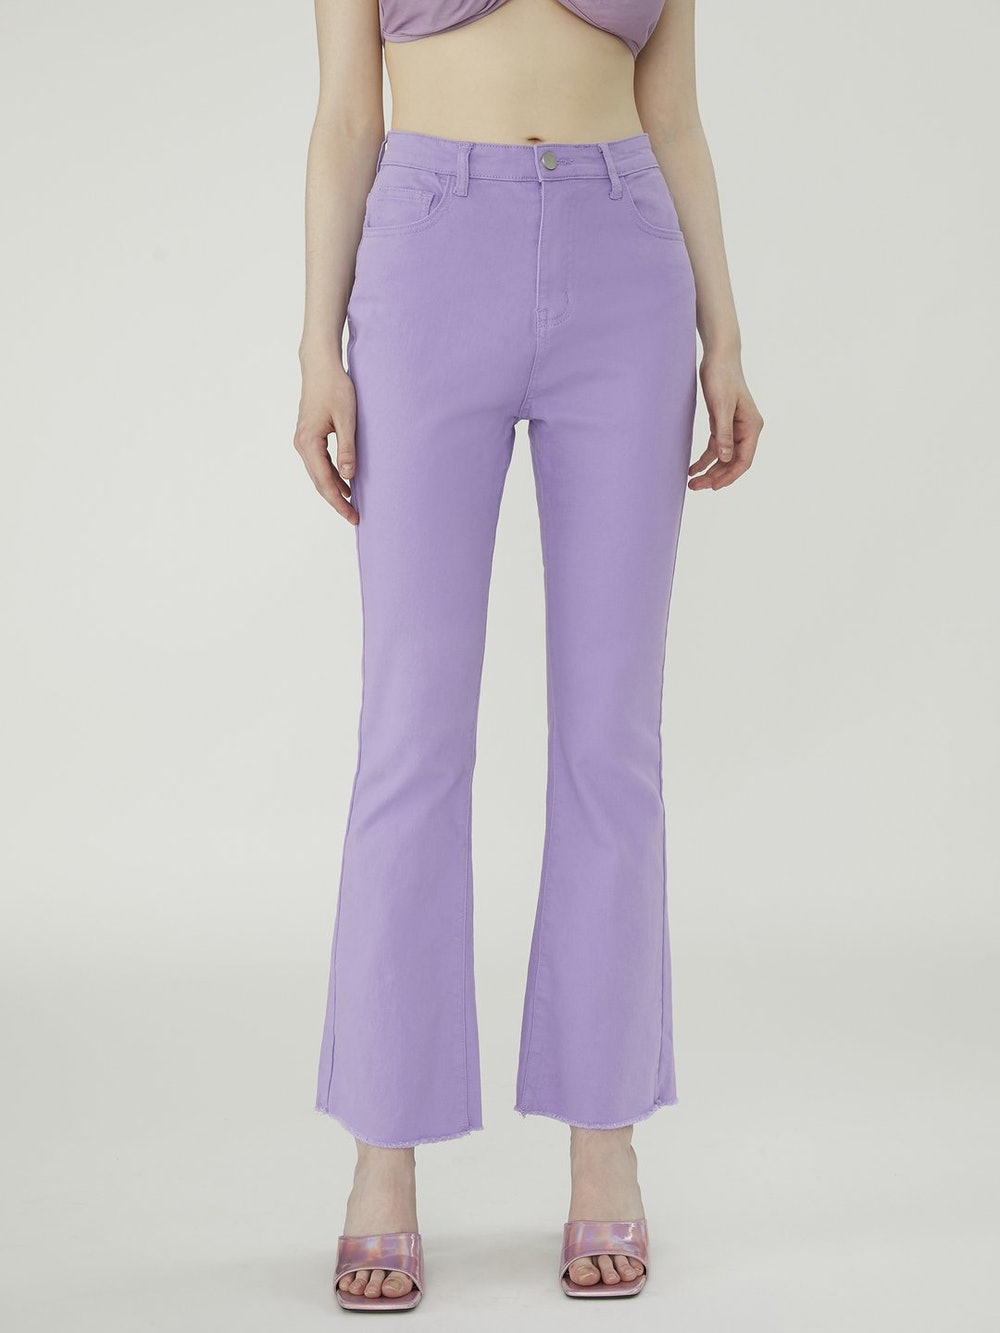 Purple Flare Jeans